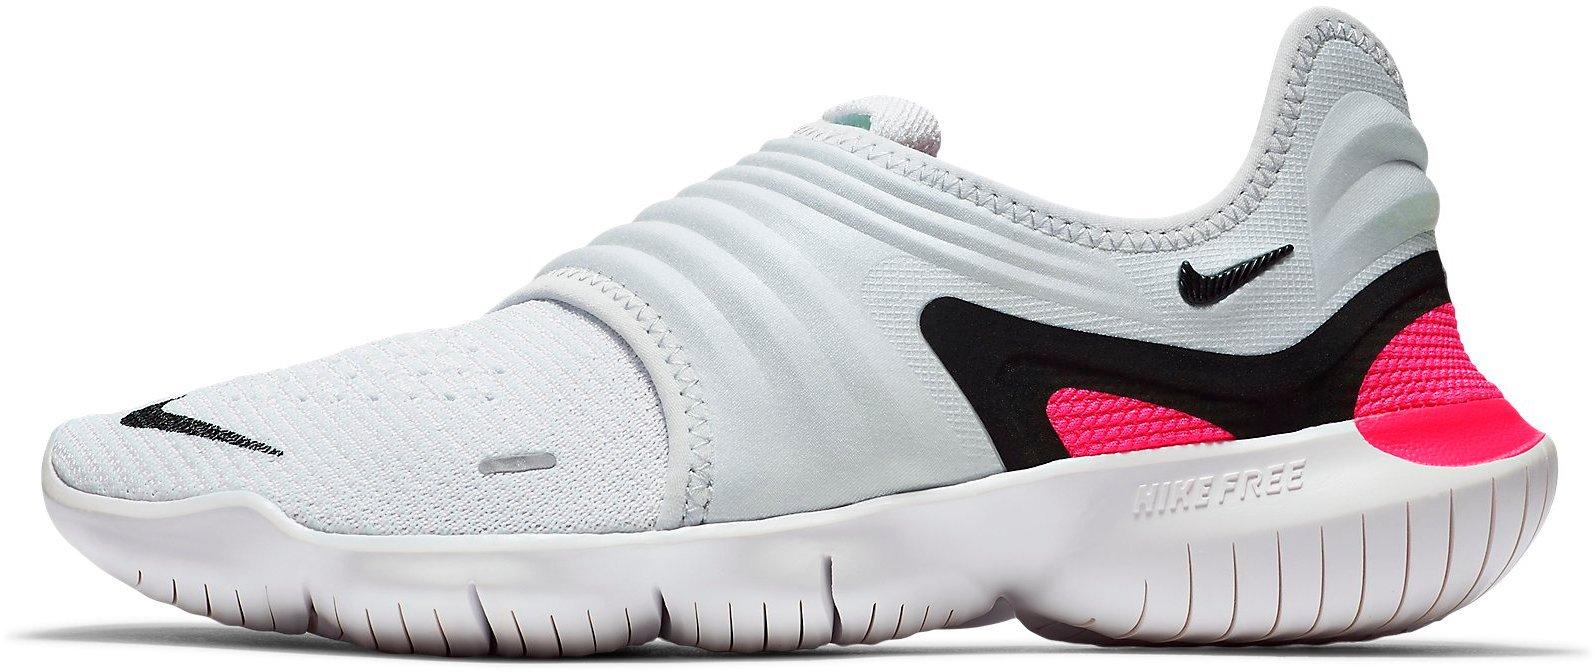 688637b21 Dámská běžecká bota Nike Free RN Flyknit 3.0 - Top4Football.cz